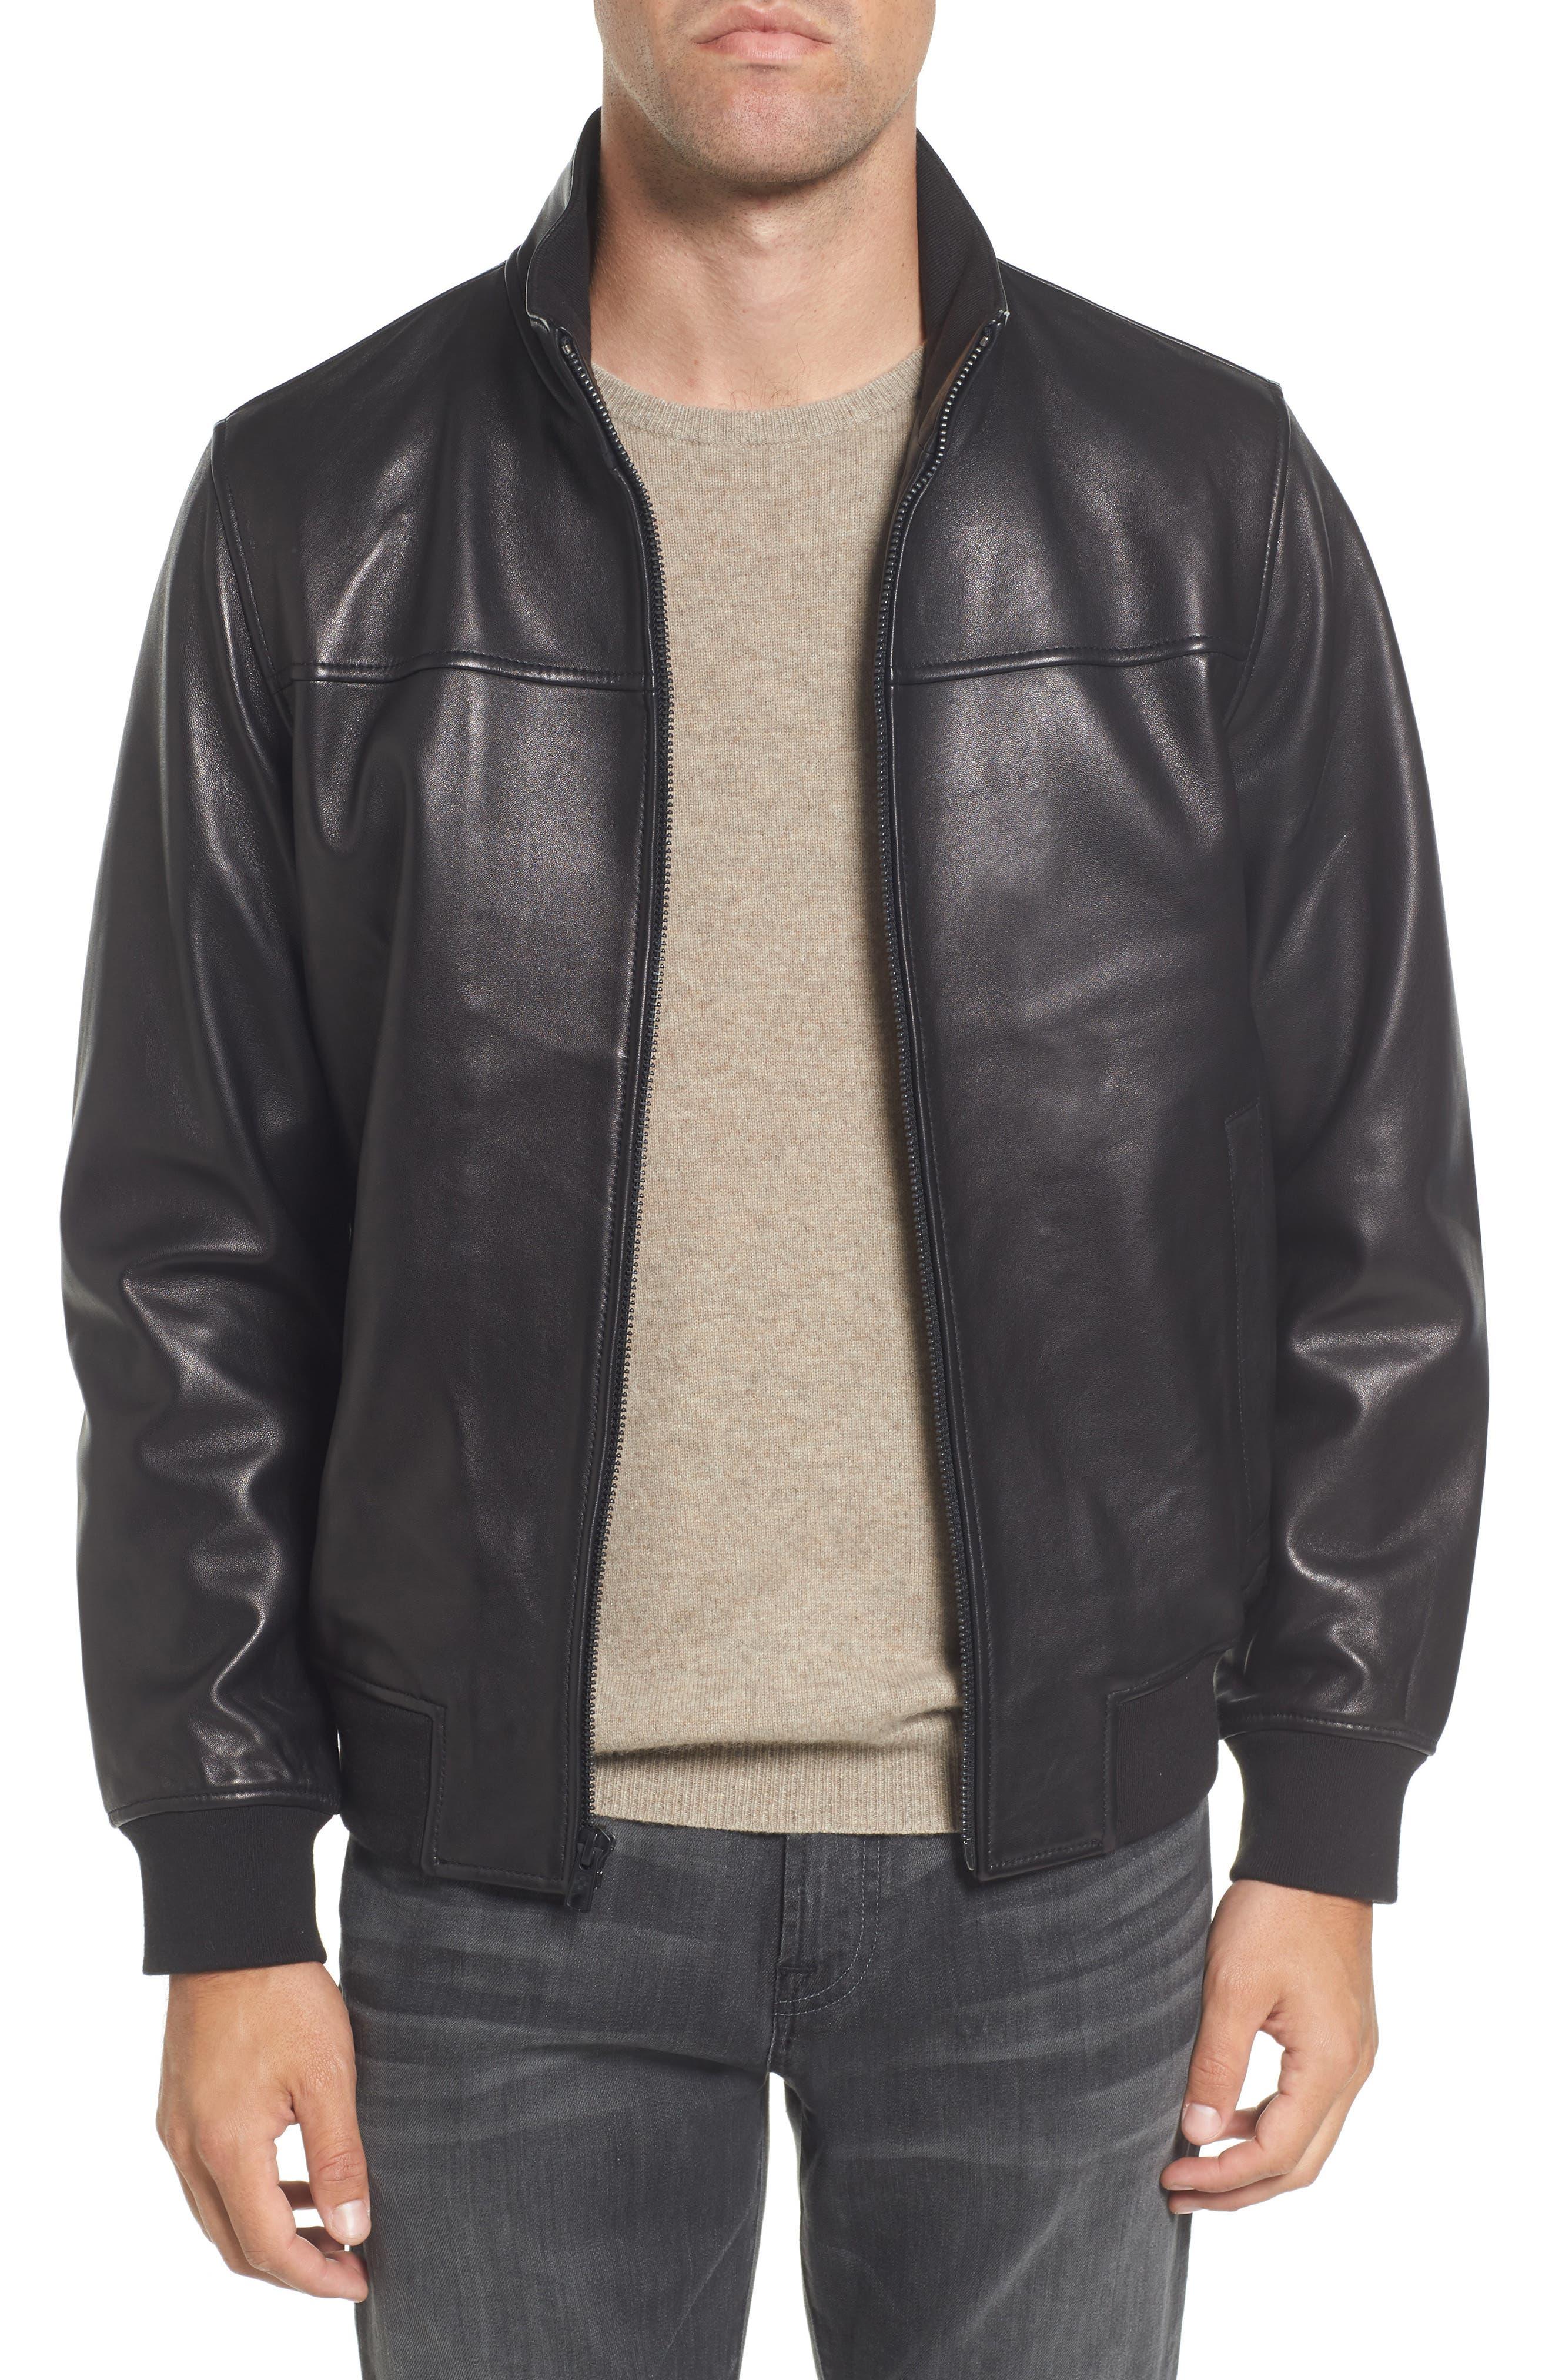 Vince Camuto Lambskin Leather Bomber Jacket